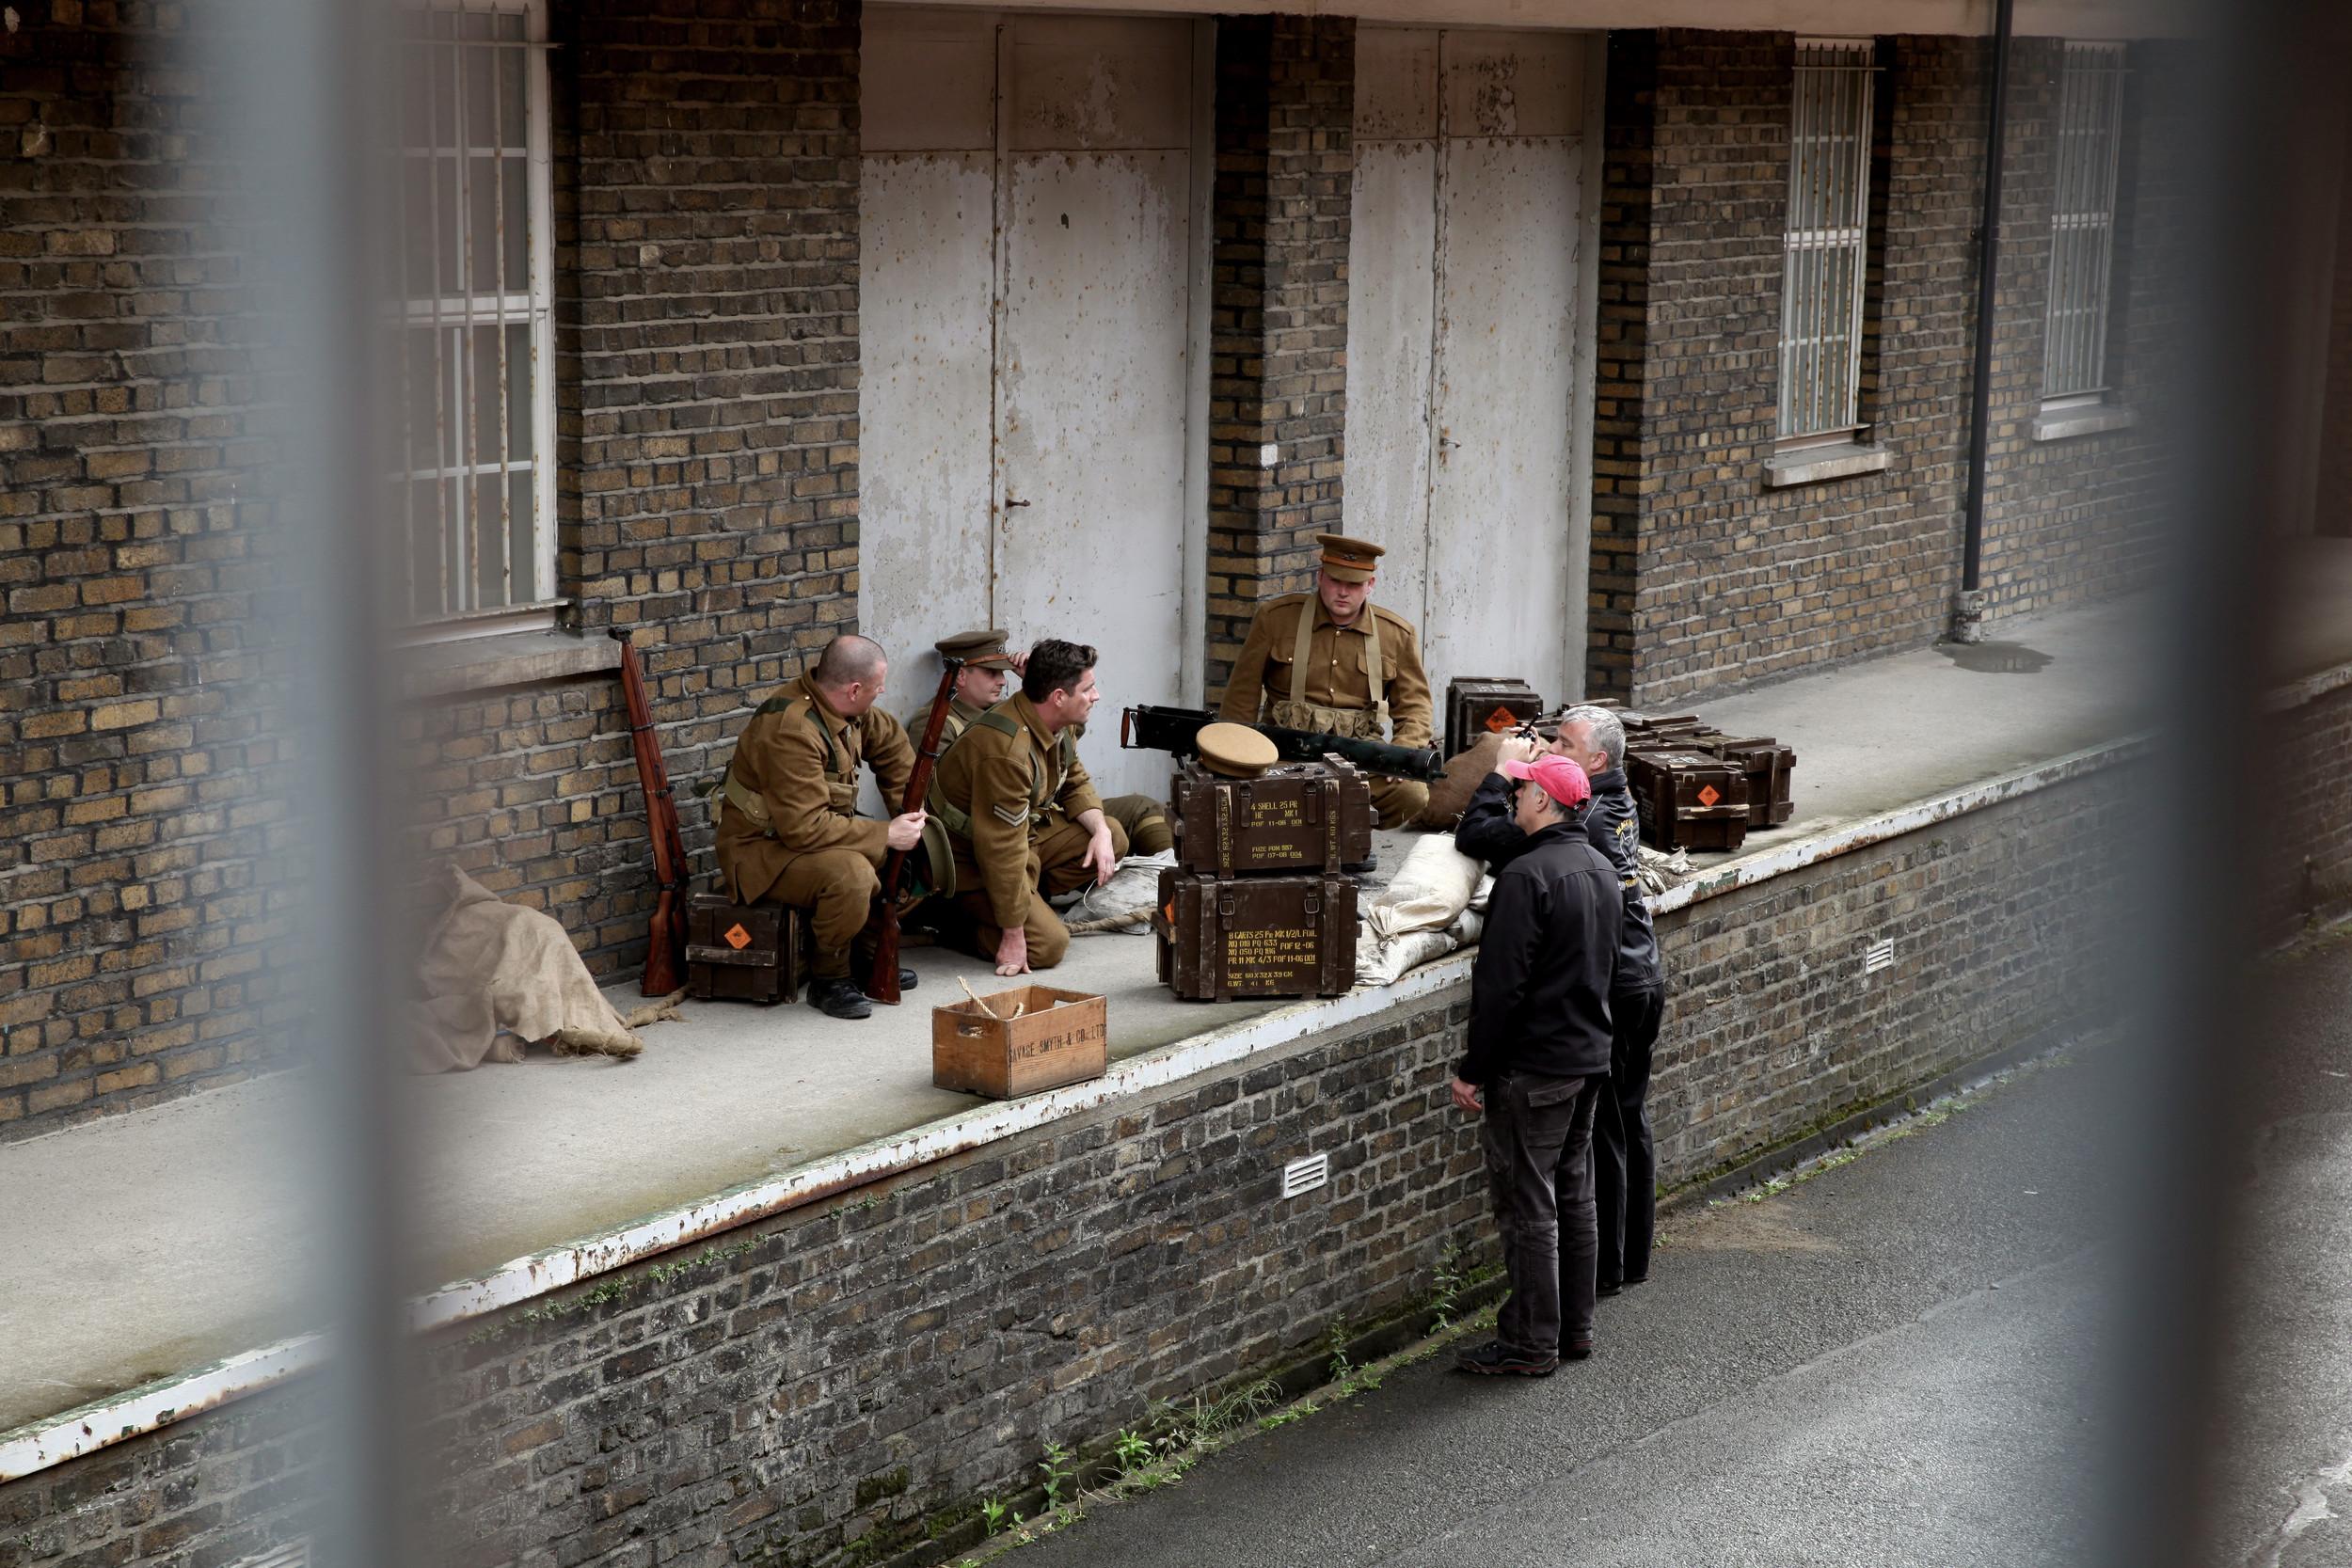 Stunt Coordinators Paul Valentine and John Sheridan discuss tactics during filming at Cathal Brugha Barracks, Dublin.